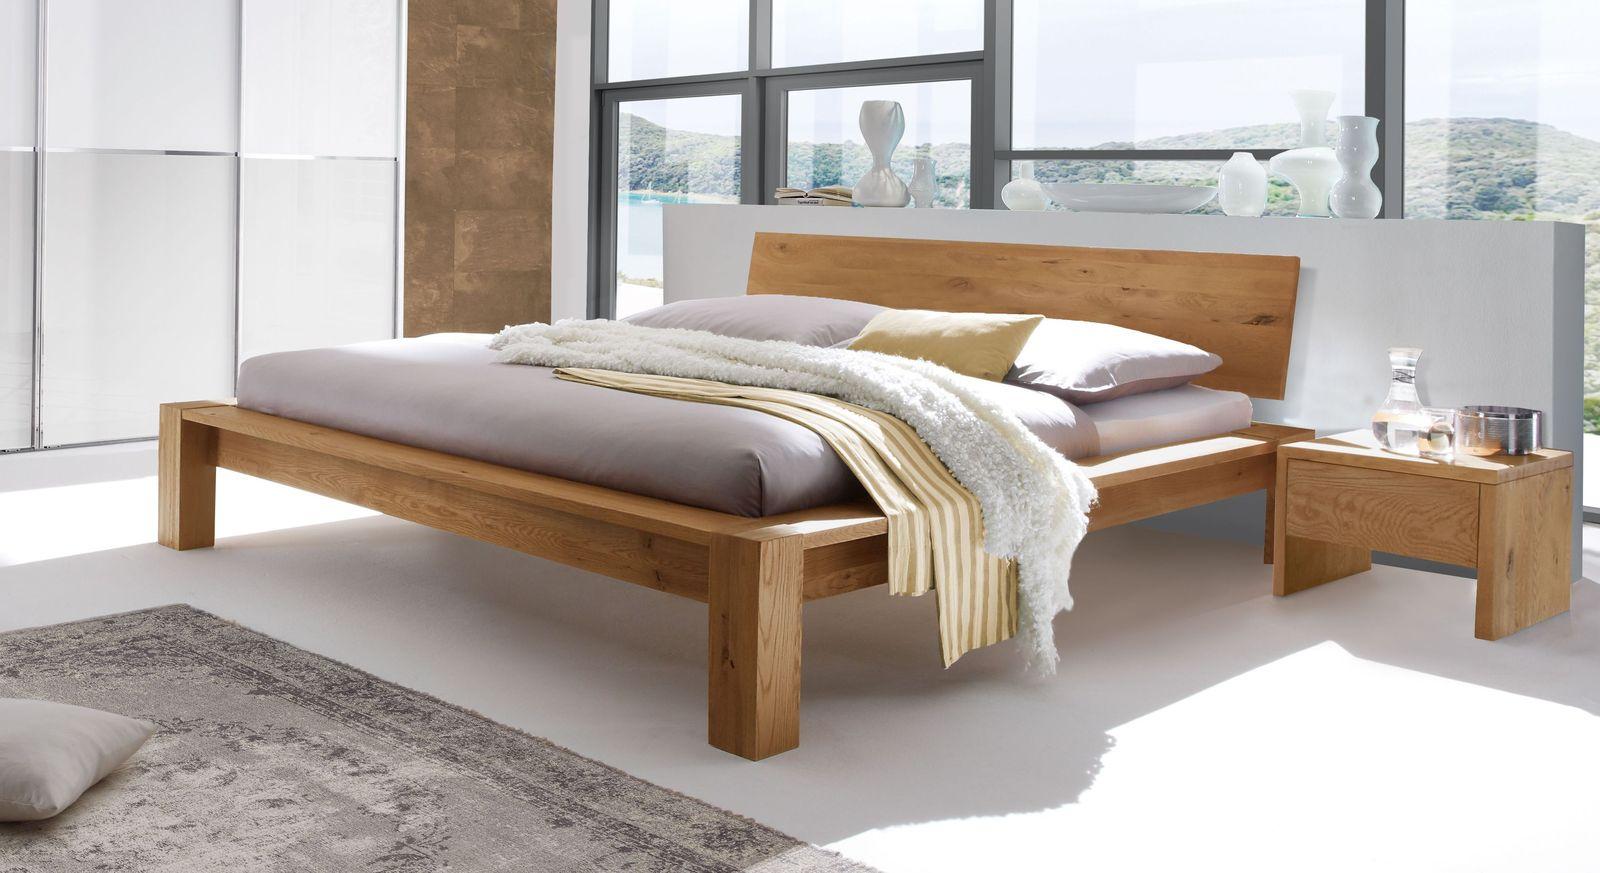 Bett Evora aus robustem Wildeichenholz